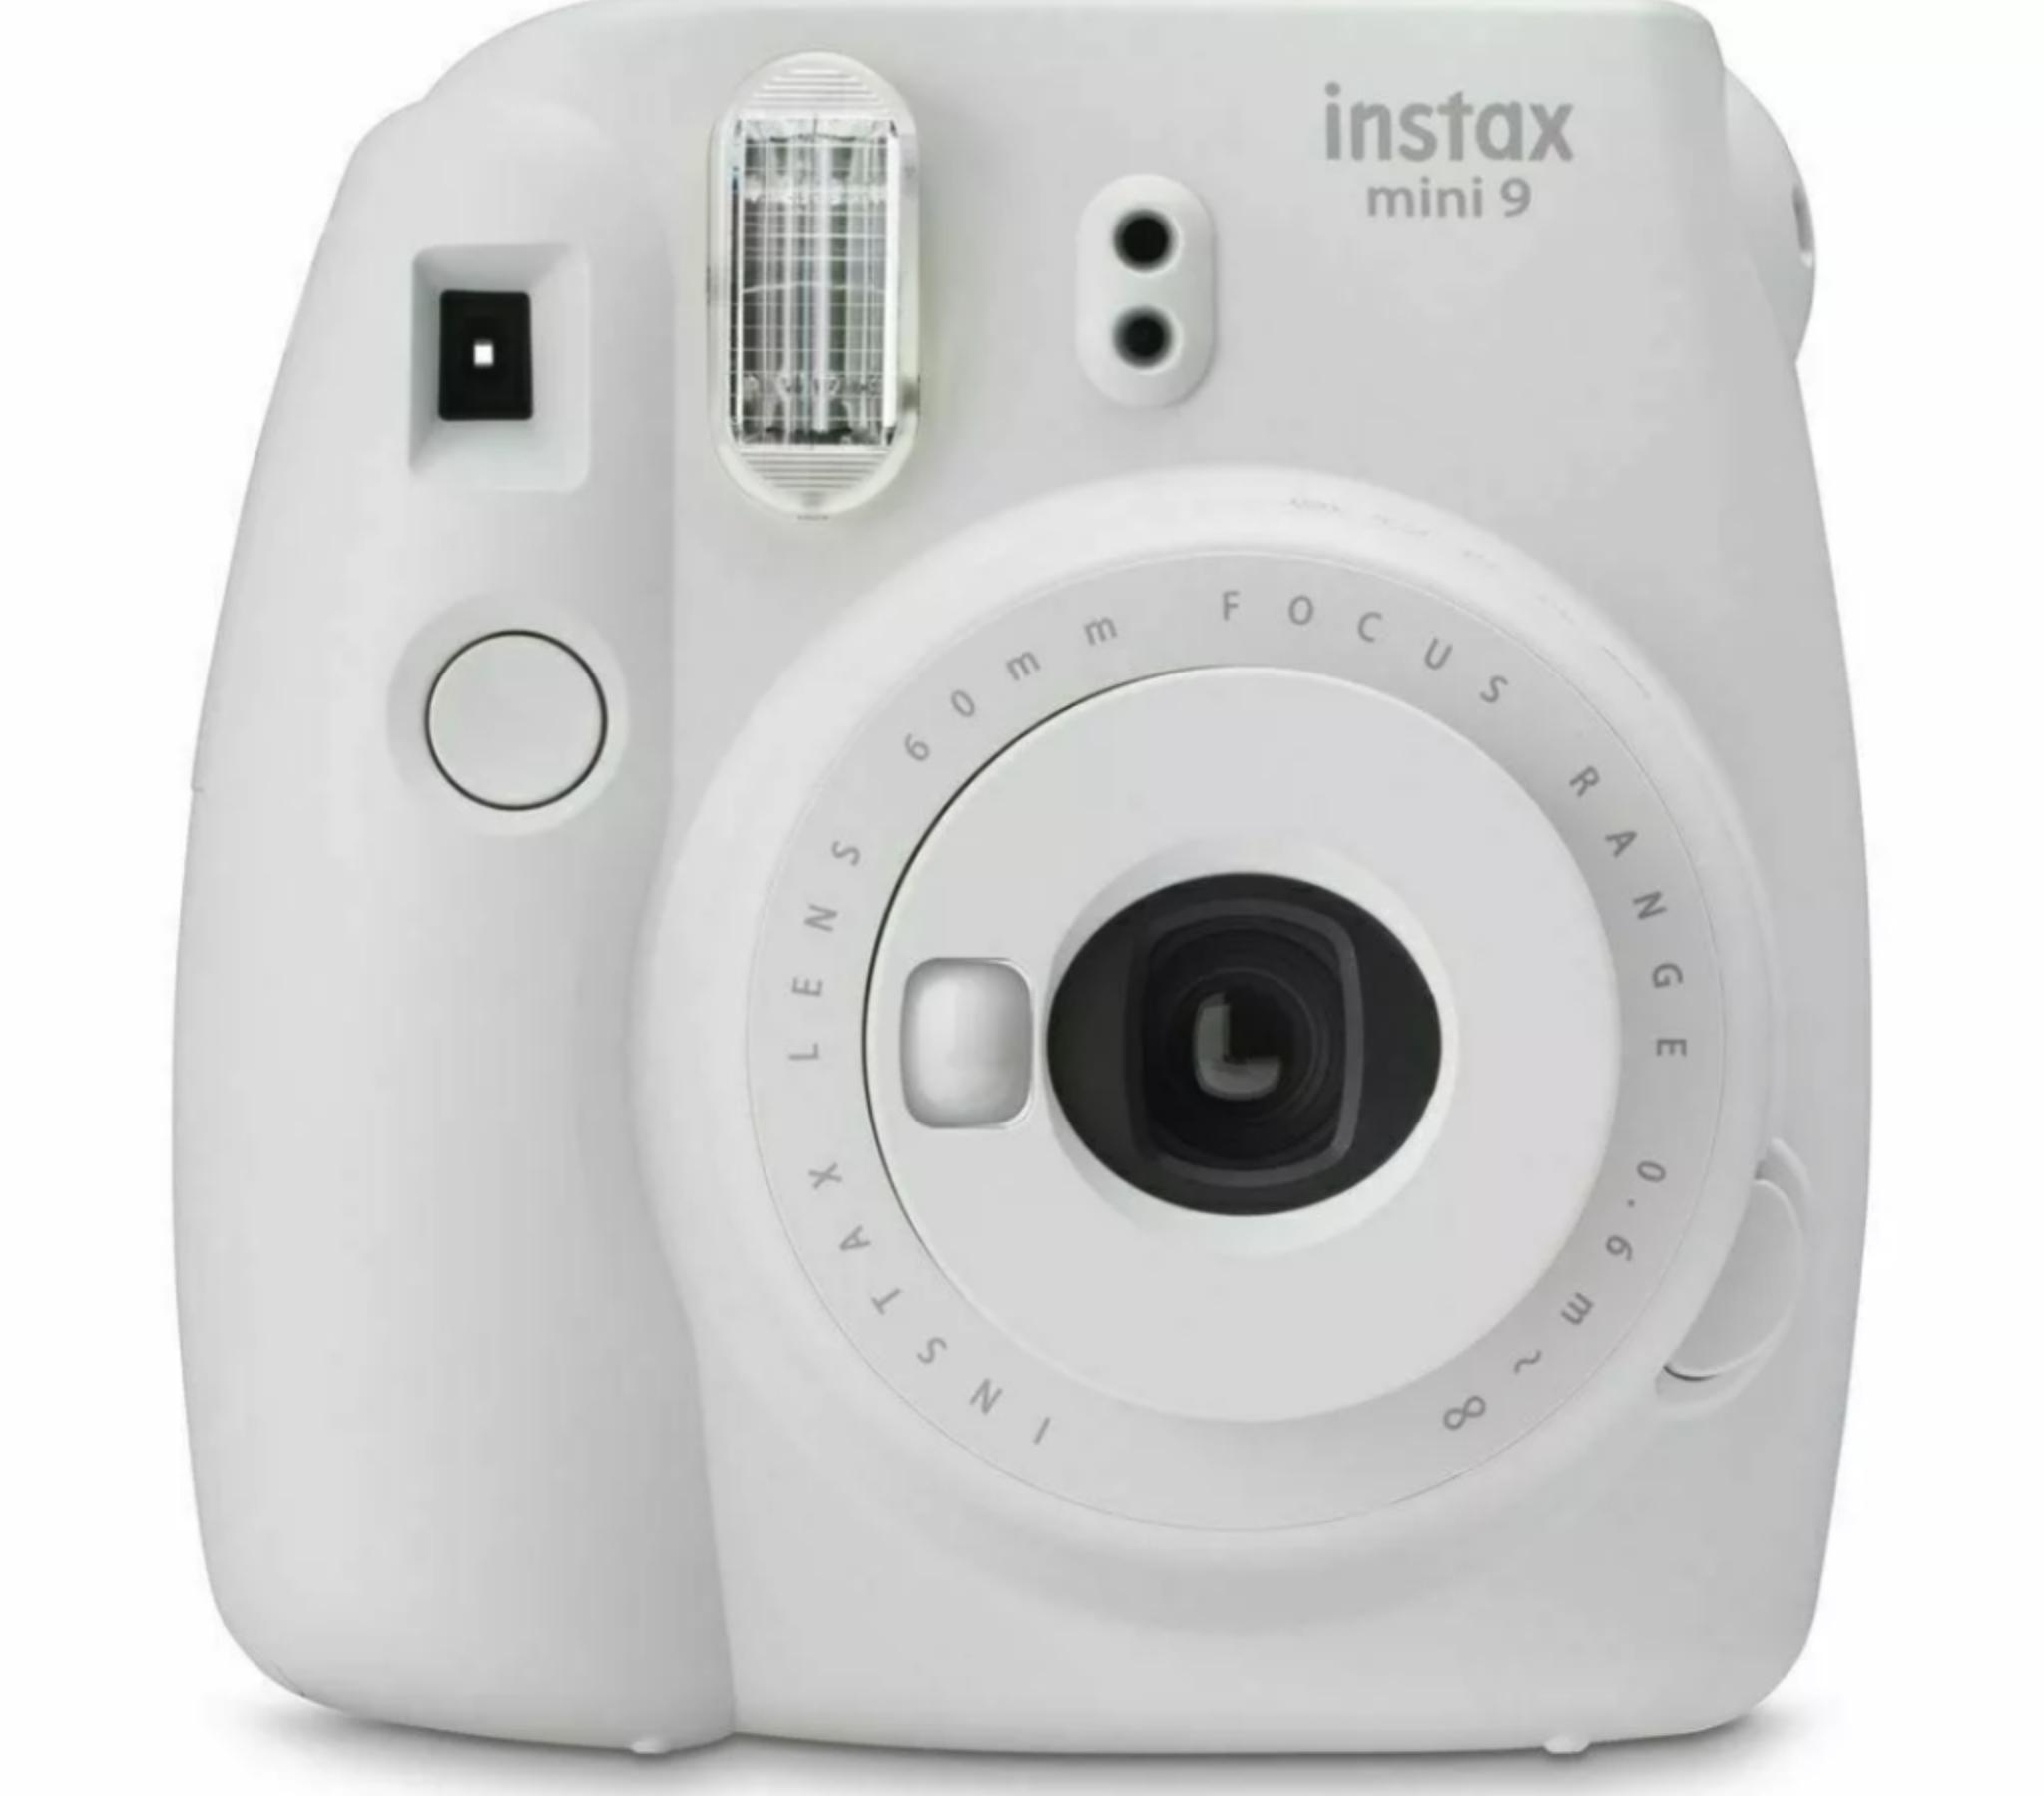 INSTAX mini 9 Instant Camera - Smoky White £39.97 @ Currys/PC World eBay store